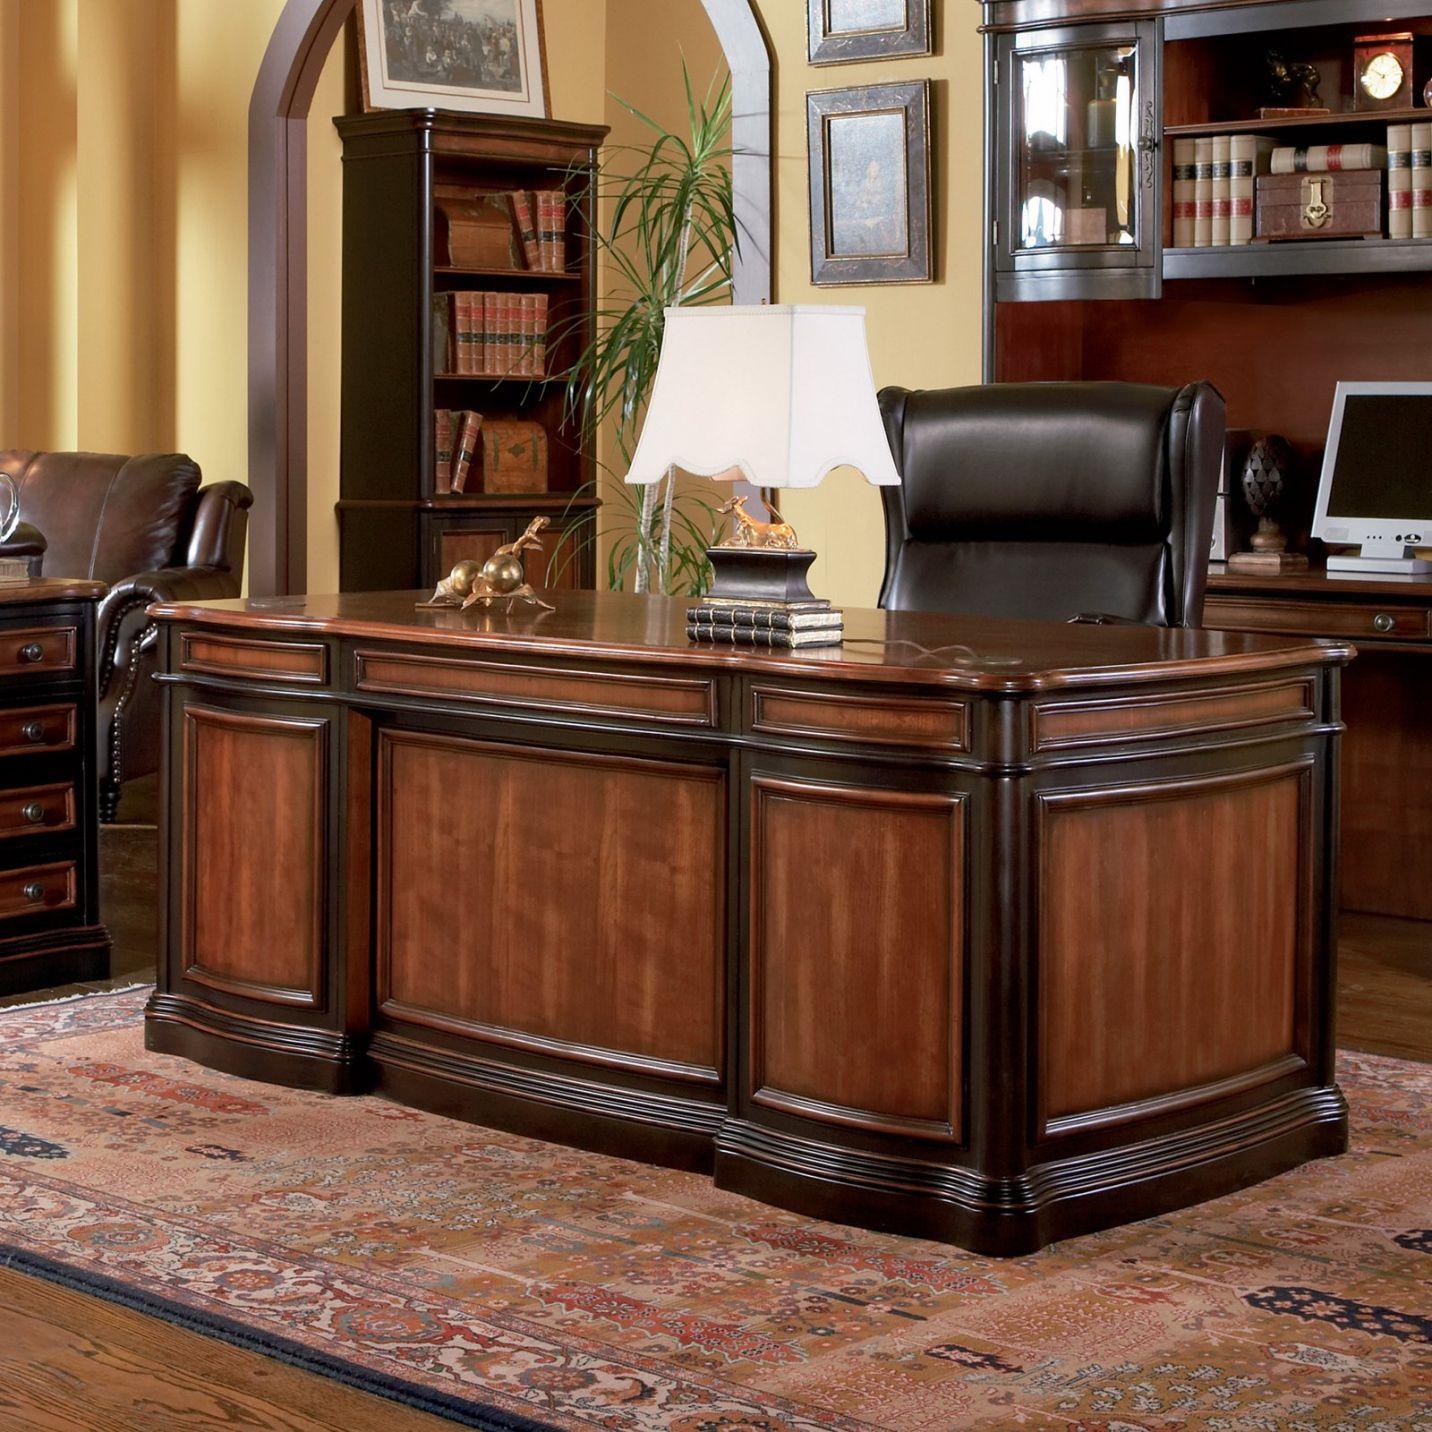 Coaster Executive Desk Home fice Furniture Check more